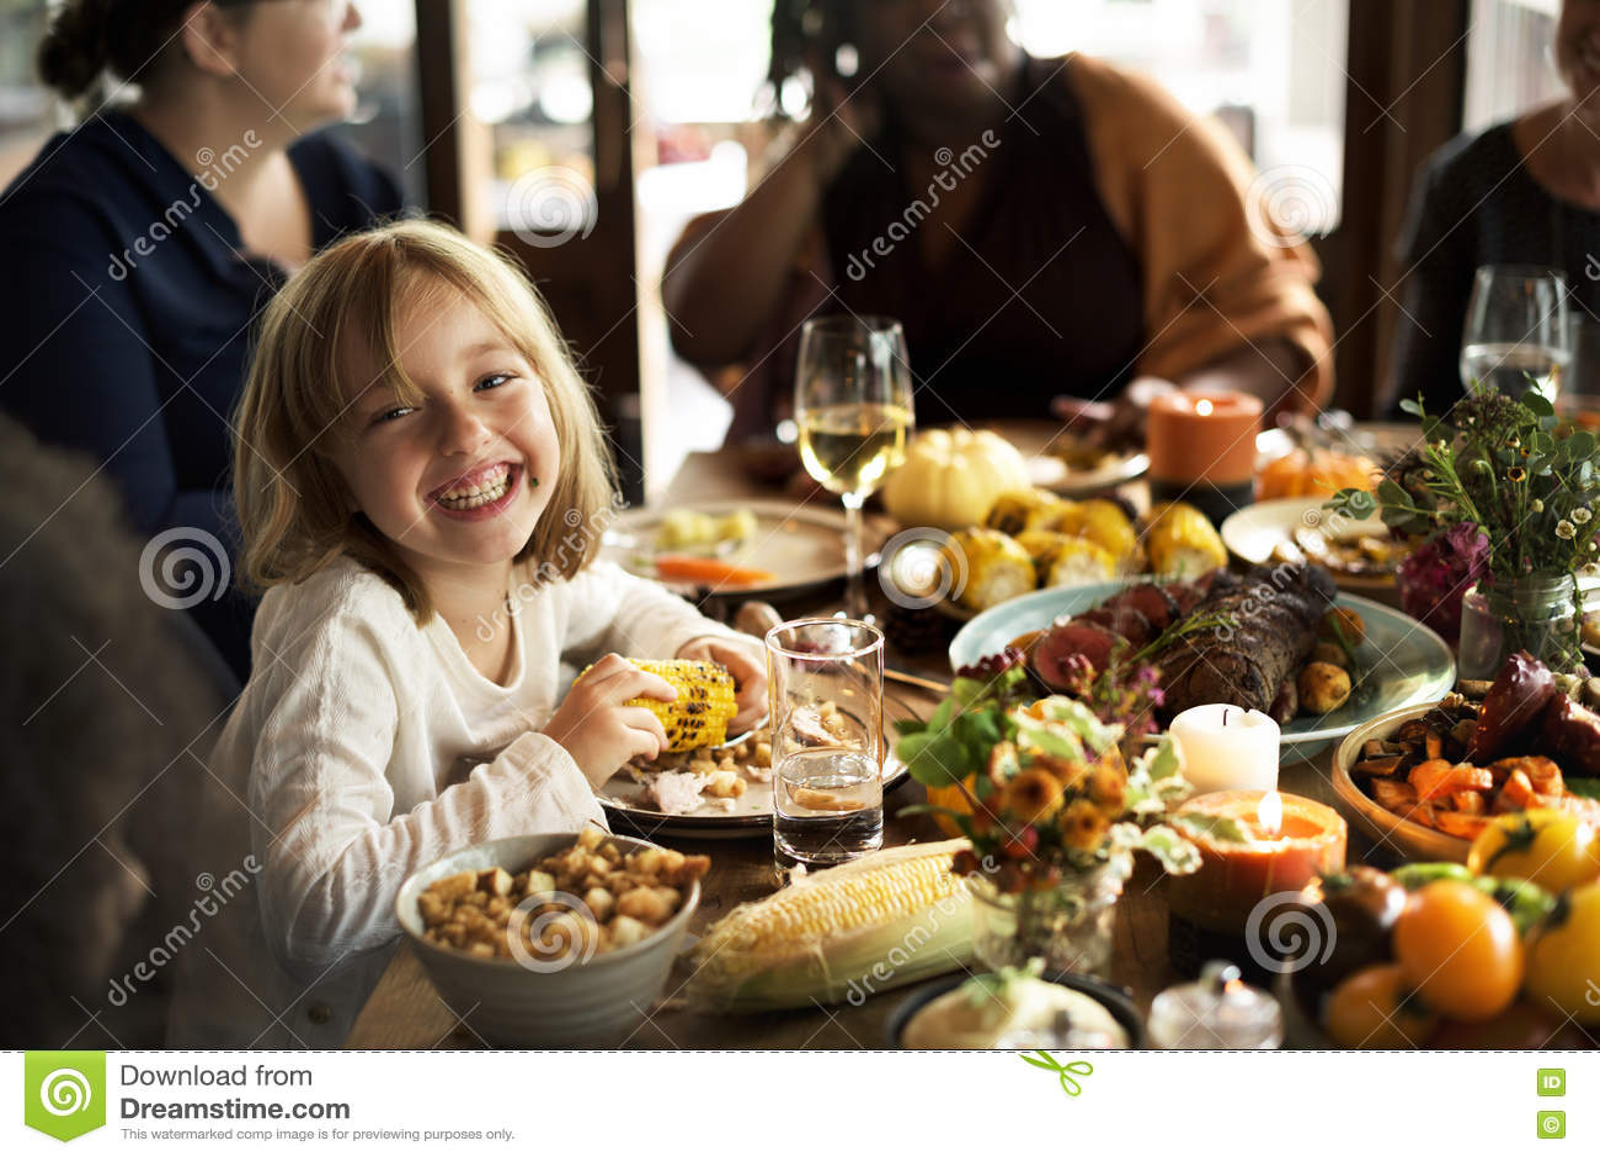 Kleines Mädchen-Essenmais-Danksagungs-Feier-Konzept